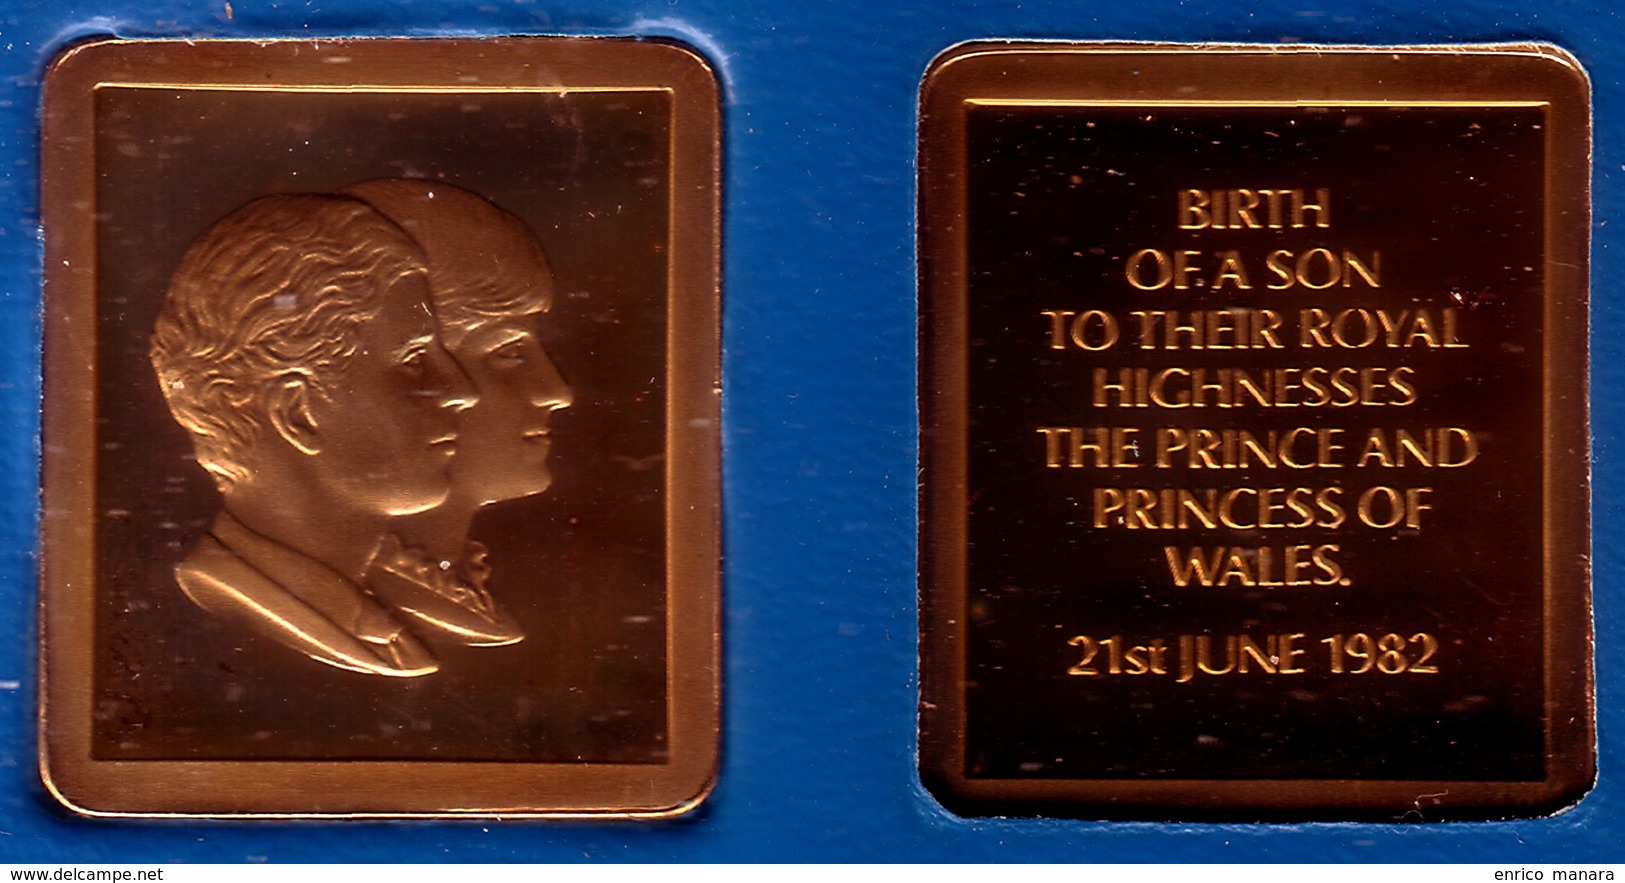 ISLE OF MAN - Medal 1982 - BIRTH OF PRINCE WILLIAM BronzeProof - Monarchia/ Nobiltà